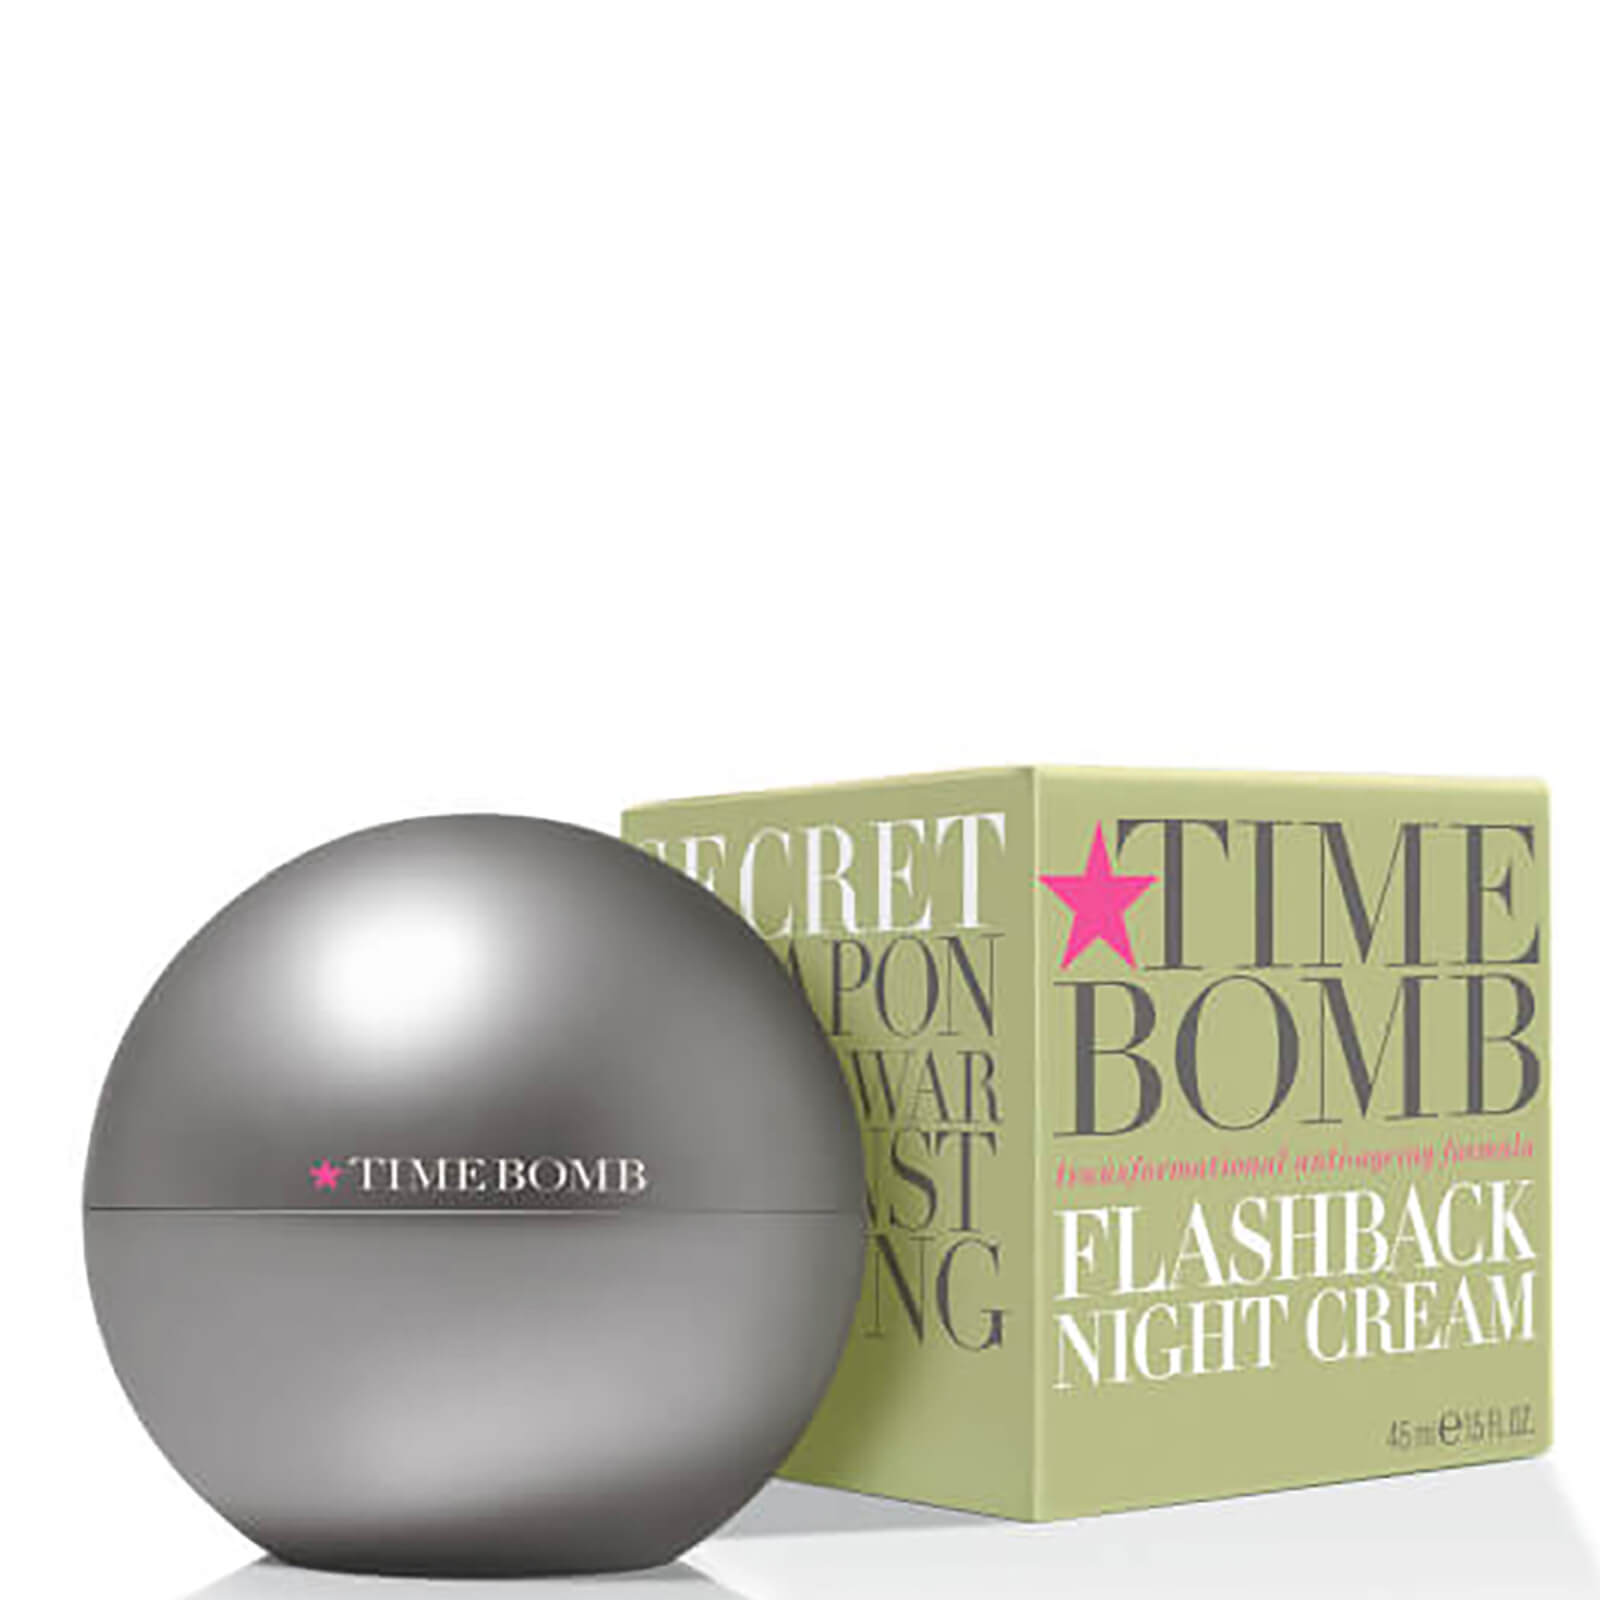 Time Bomb Flashback crema notte anti-età 45 ml